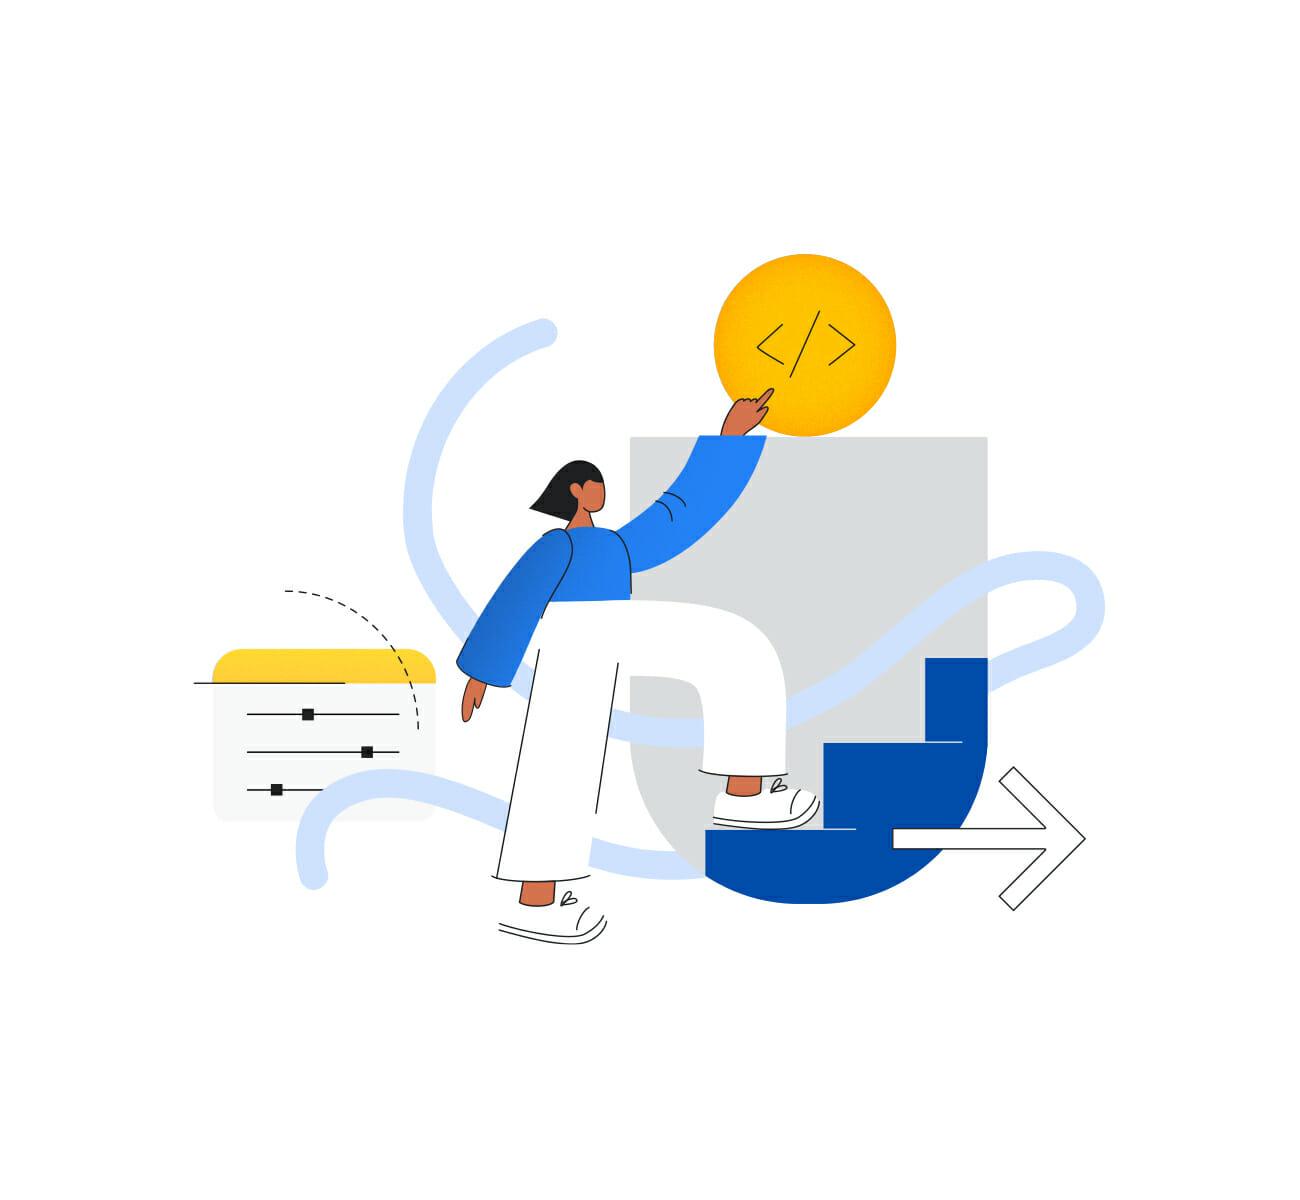 [GCP] Google Cloud Learn